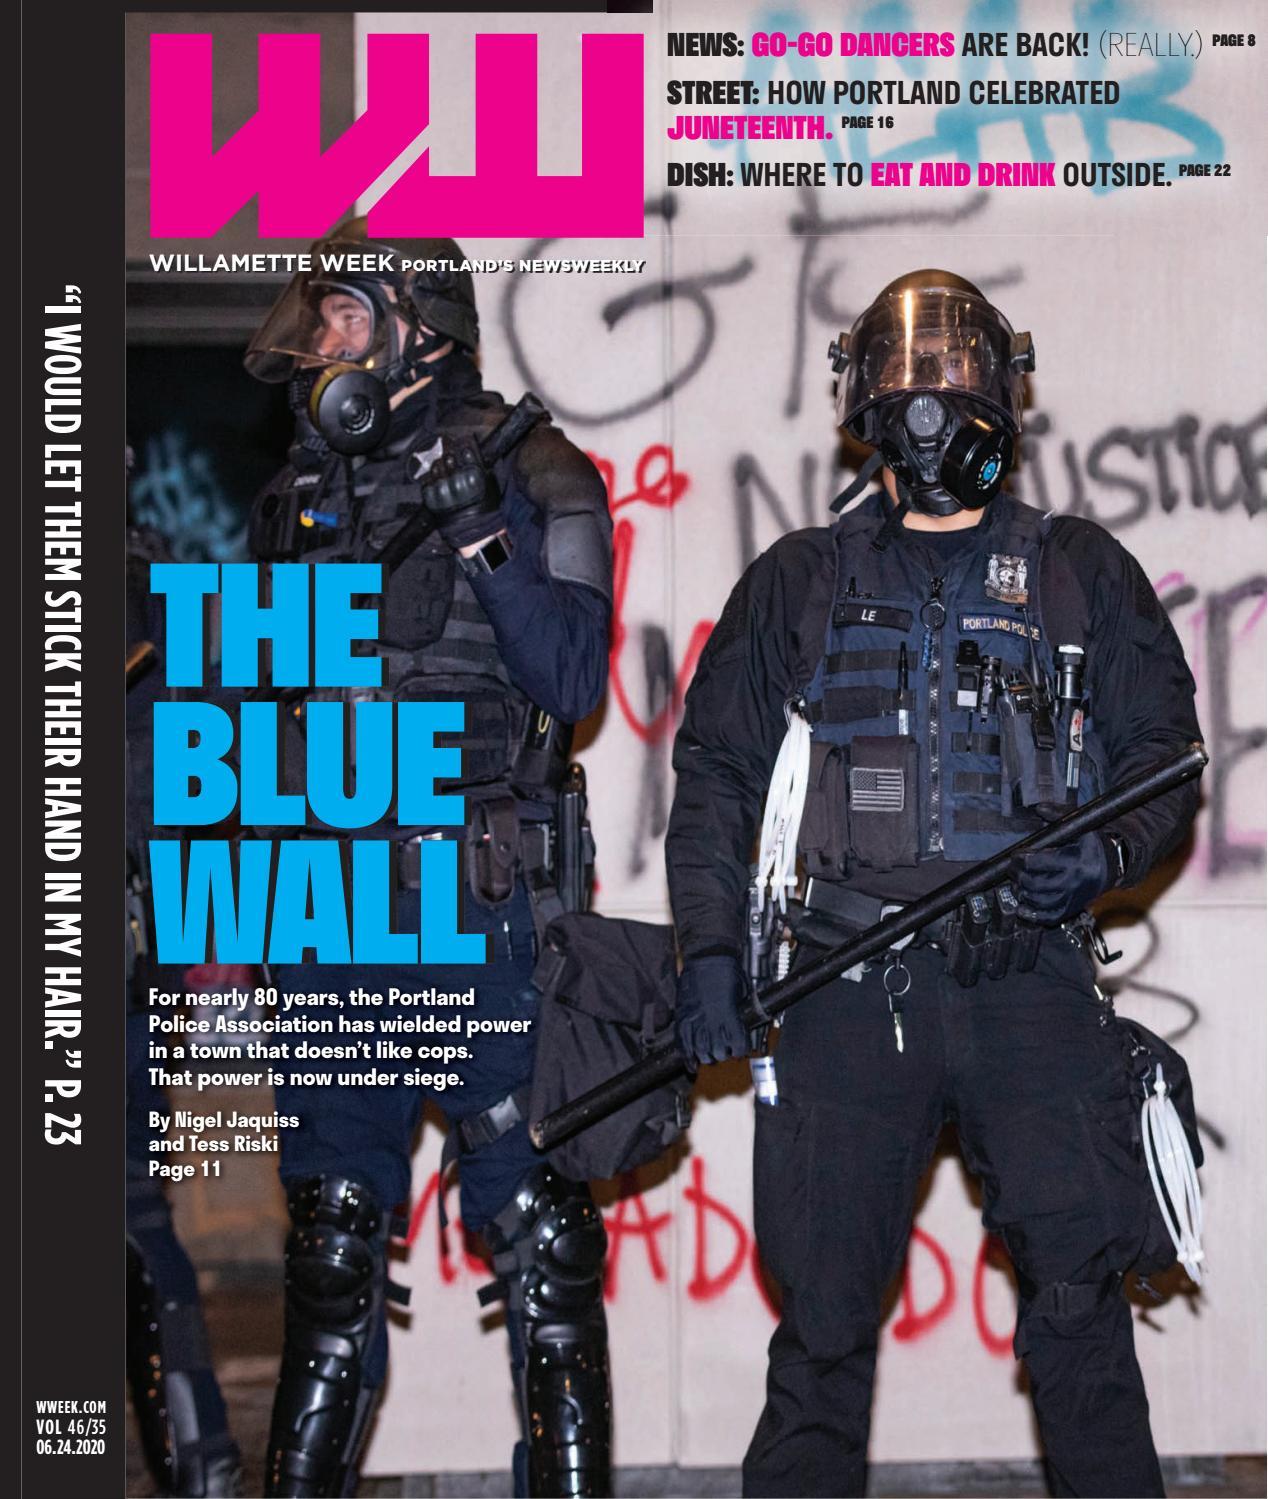 Willamette Week June 24 2020 Volume 46 Issue 35 The Blue Wall By Willamette Week Newspaper Issuu